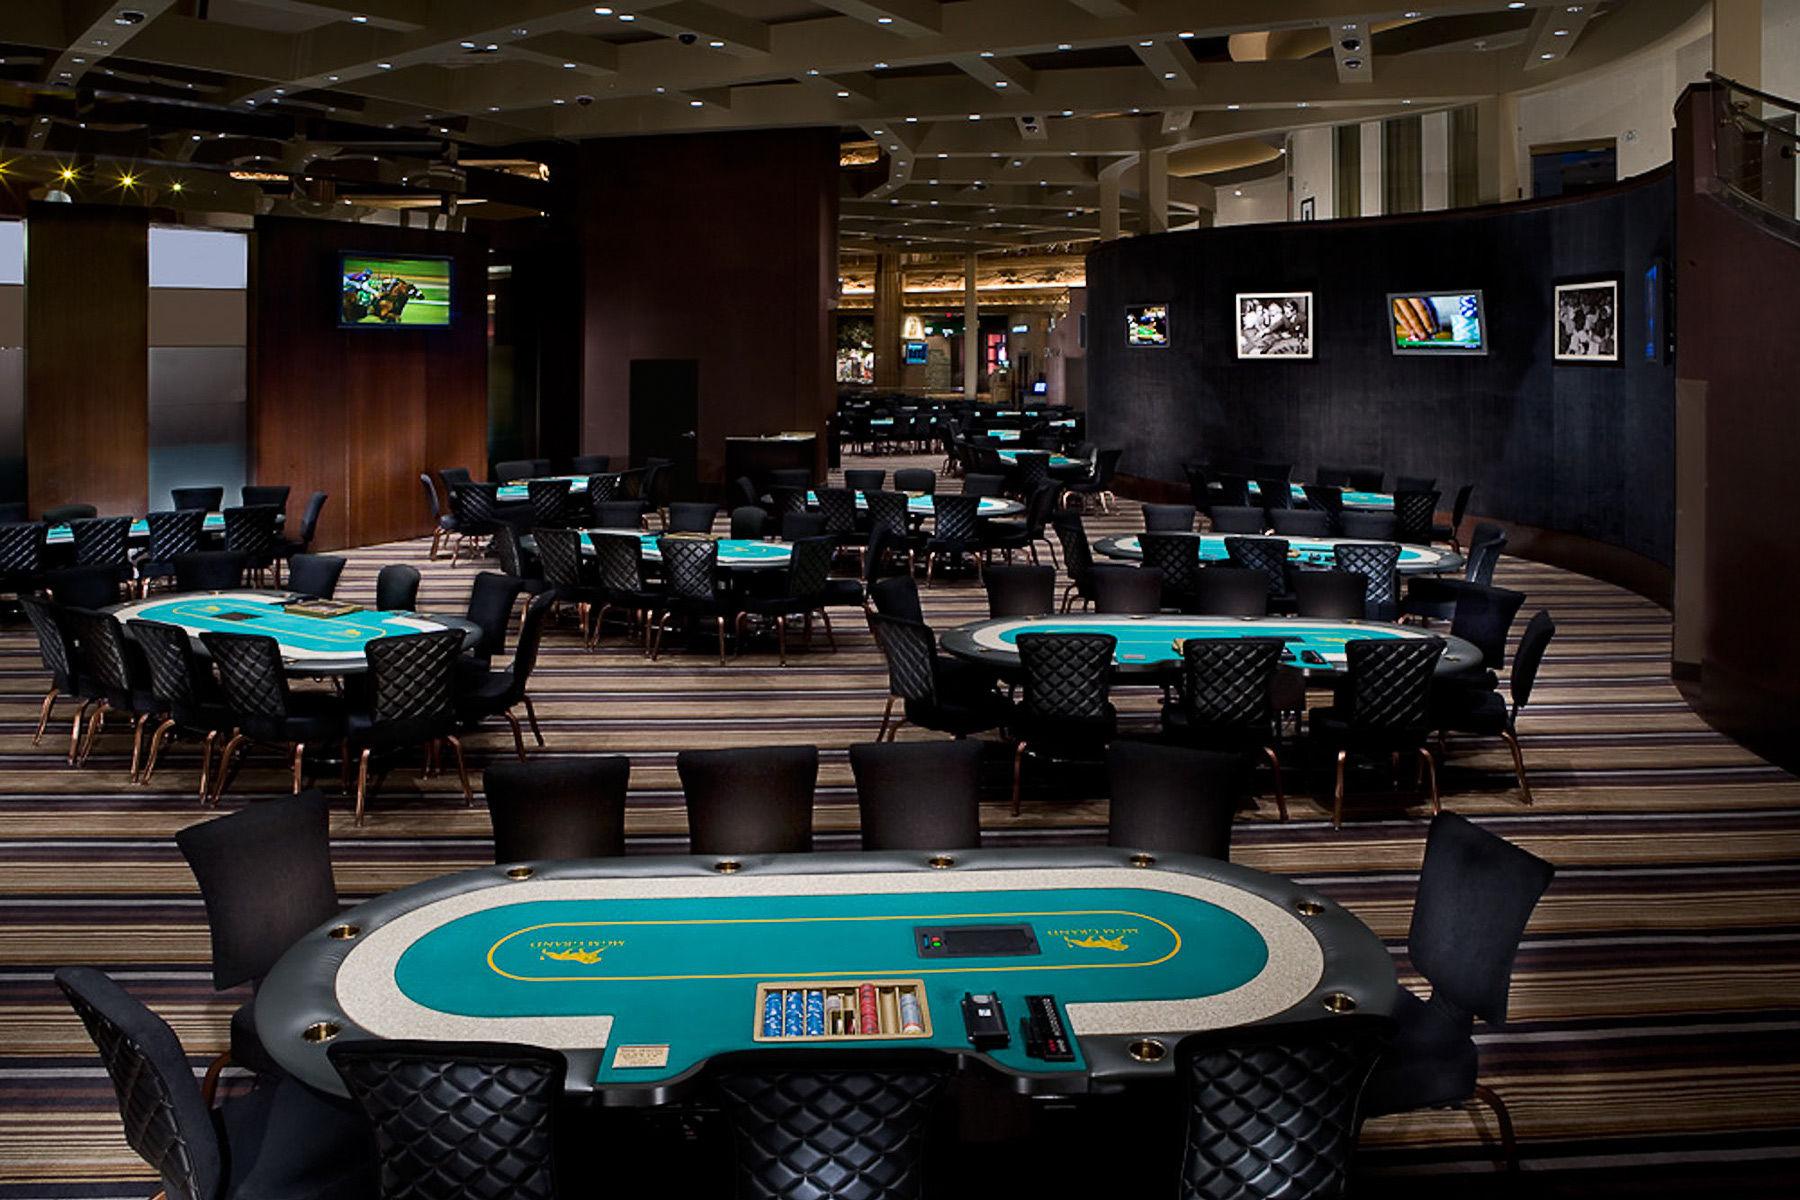 Poker room at MGM Grand Las Vegas.